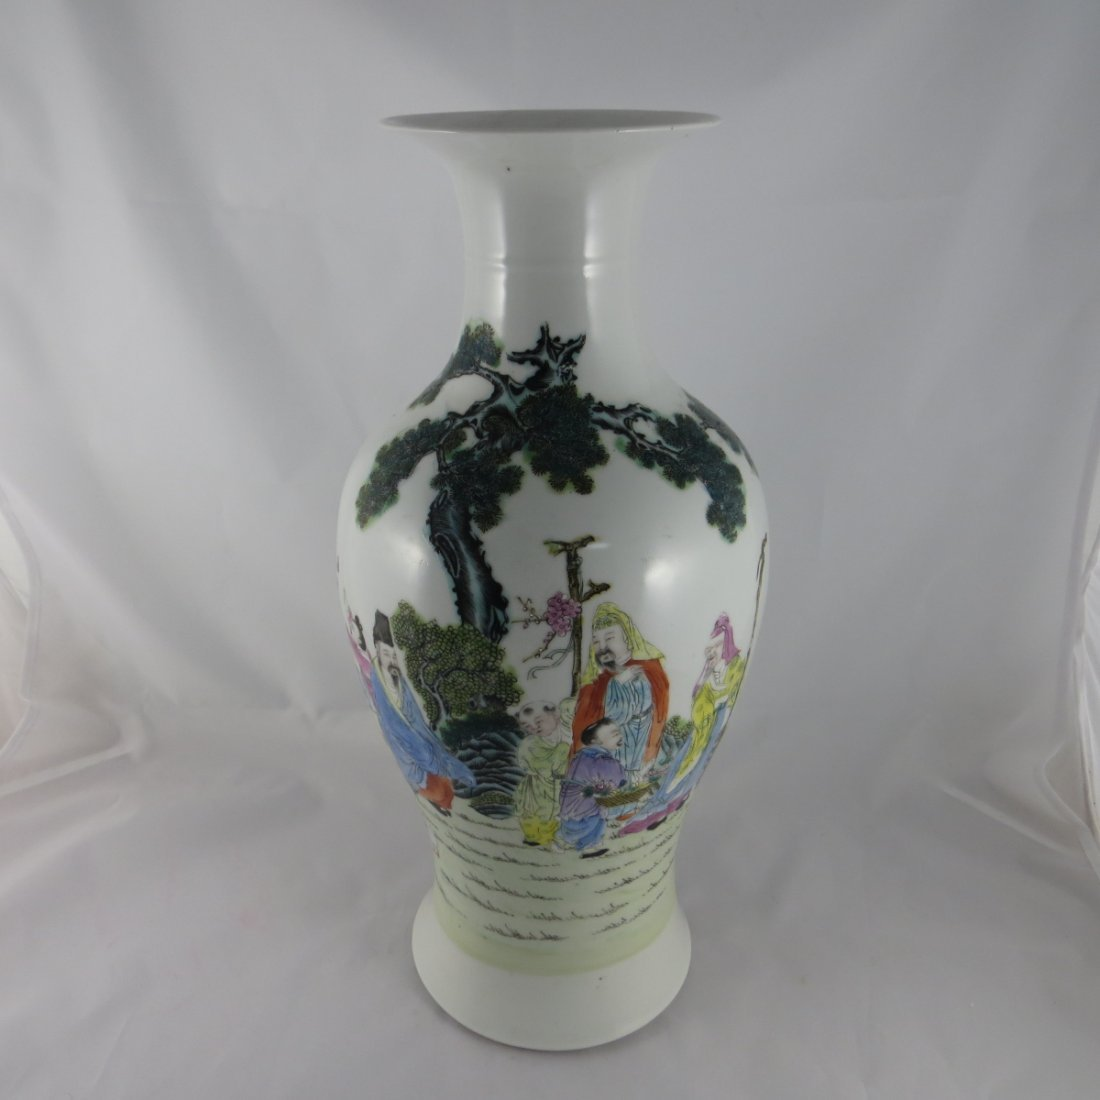 Chinese Famille Rose Vase, Republic Period